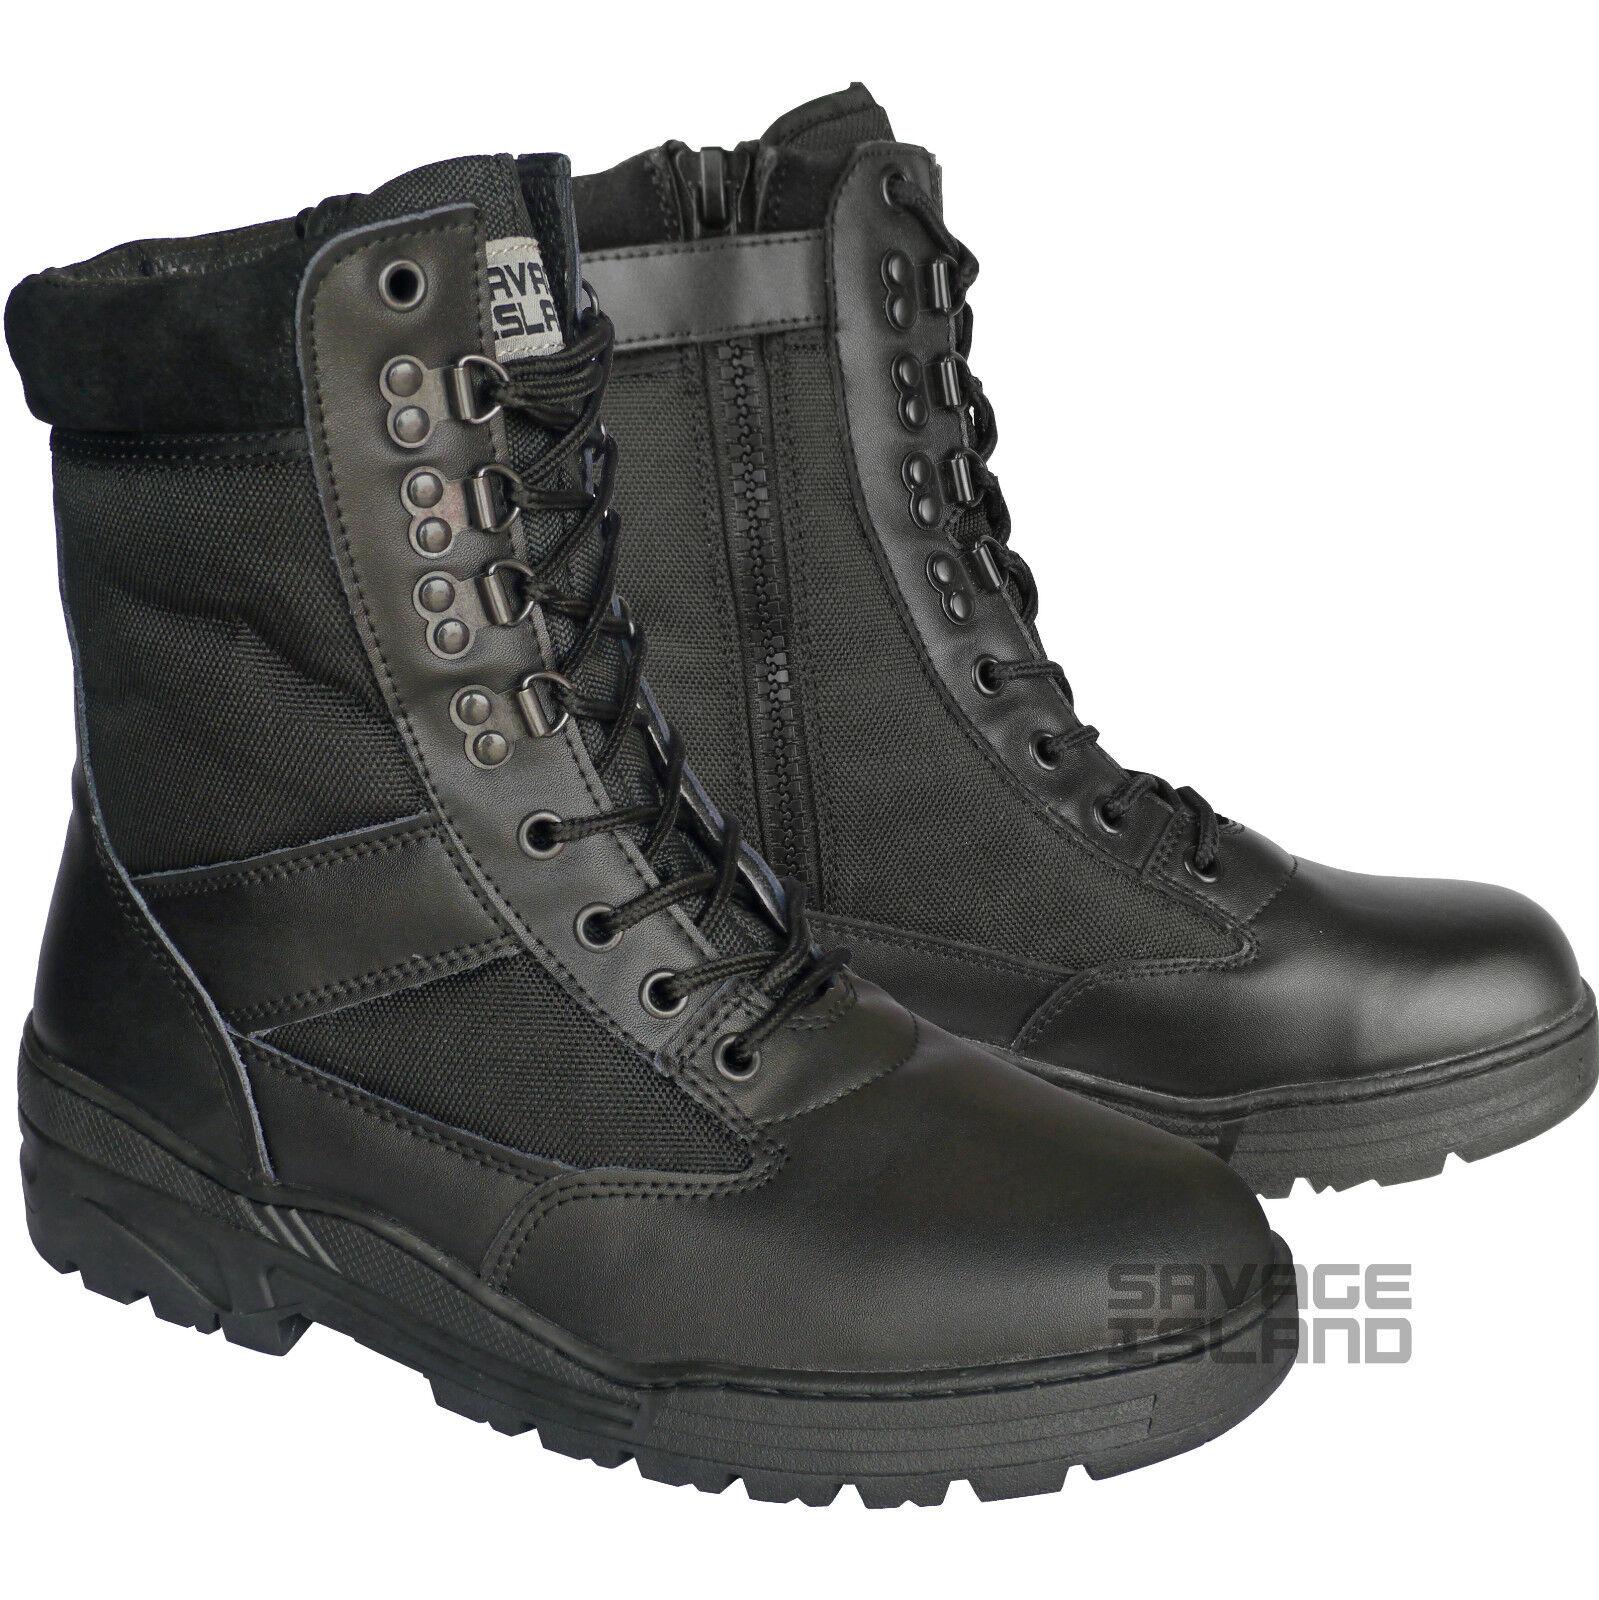 Comprar Army Botas Combat Botas Army in Hombre Botas 68e21f ... 189c045abfa5